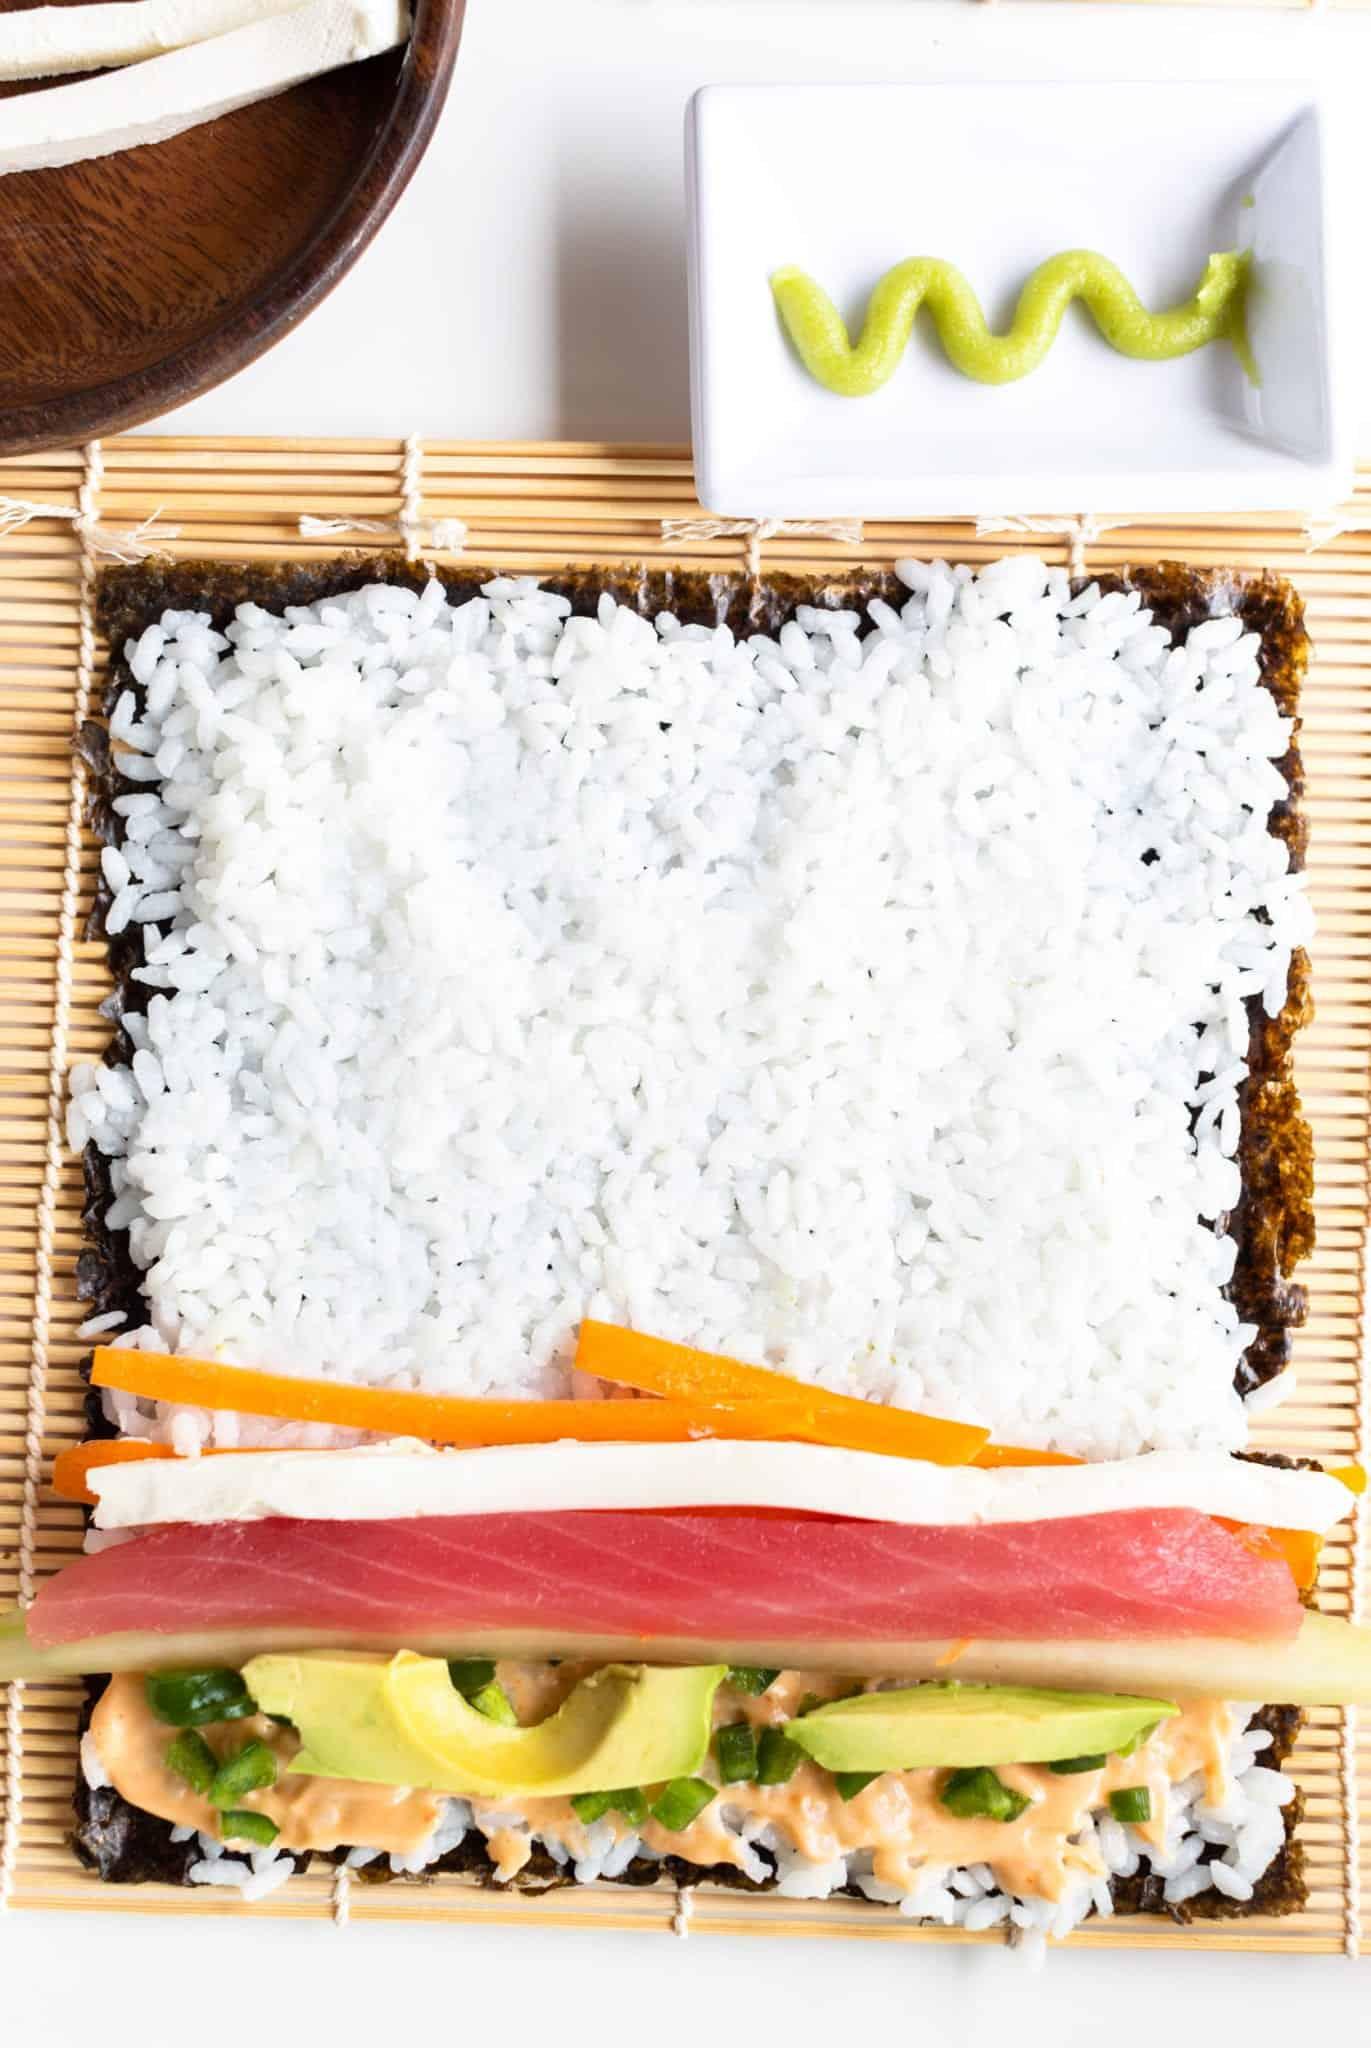 step by step sushi roll bamboo mat, nori, rice with Garlic Sriracha Ailoli, diced jalapeno, cucumber Ahi tuna, cream cheese, avocado and carrots #sushi #spicytunamaki #sushirecipe #spicytuna #sushirollrecipes #spicytunamaki #crunchyspicytunaroll